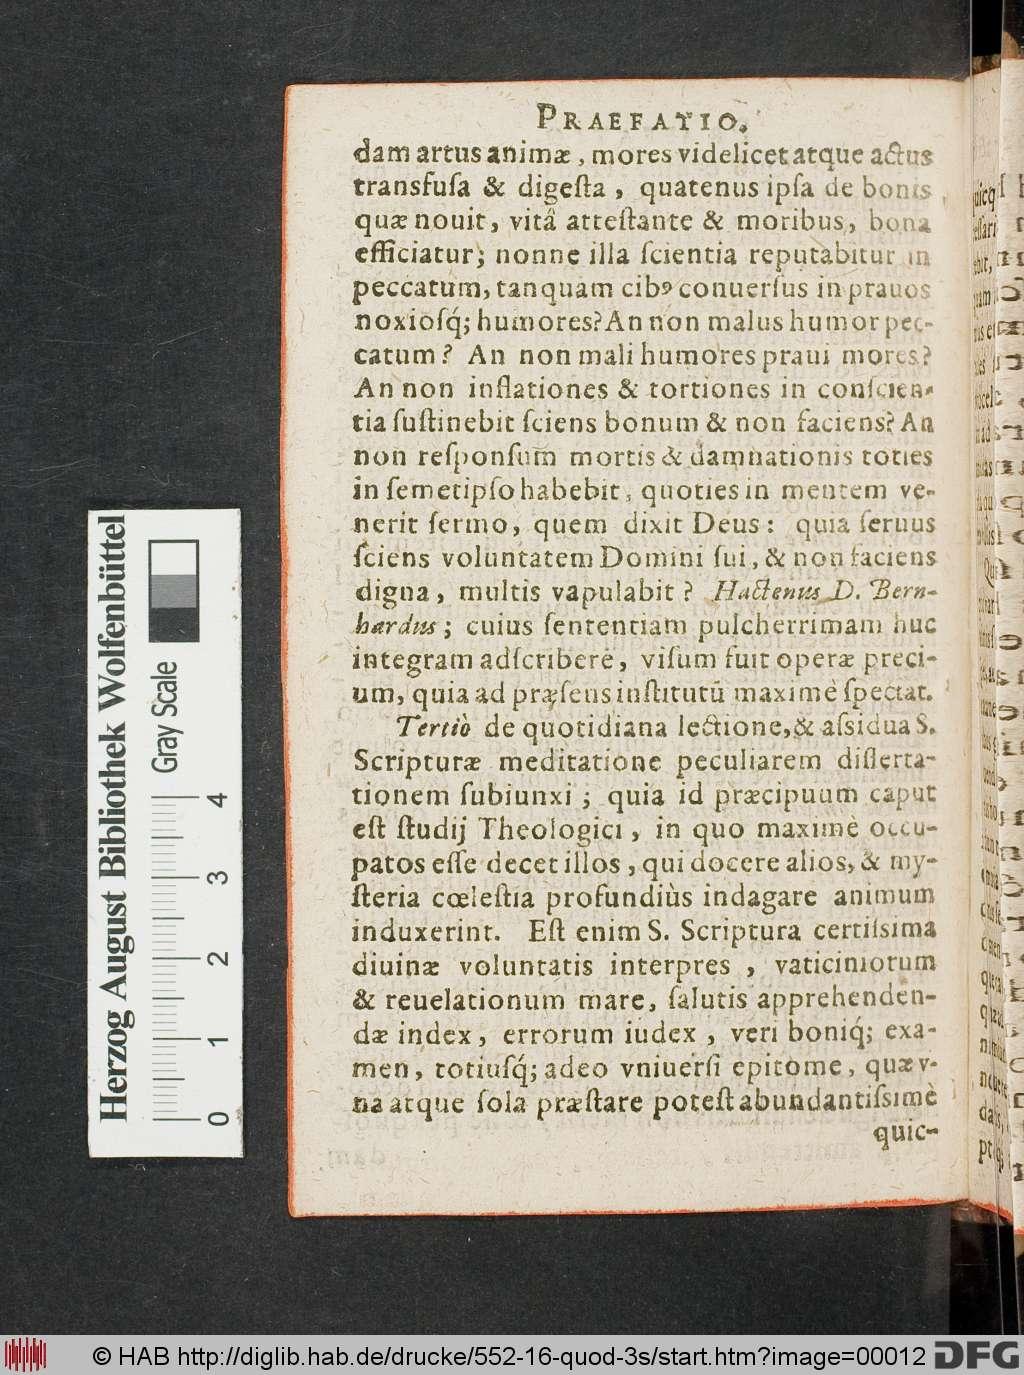 http://diglib.hab.de/drucke/552-16-quod-3s/00012.jpg